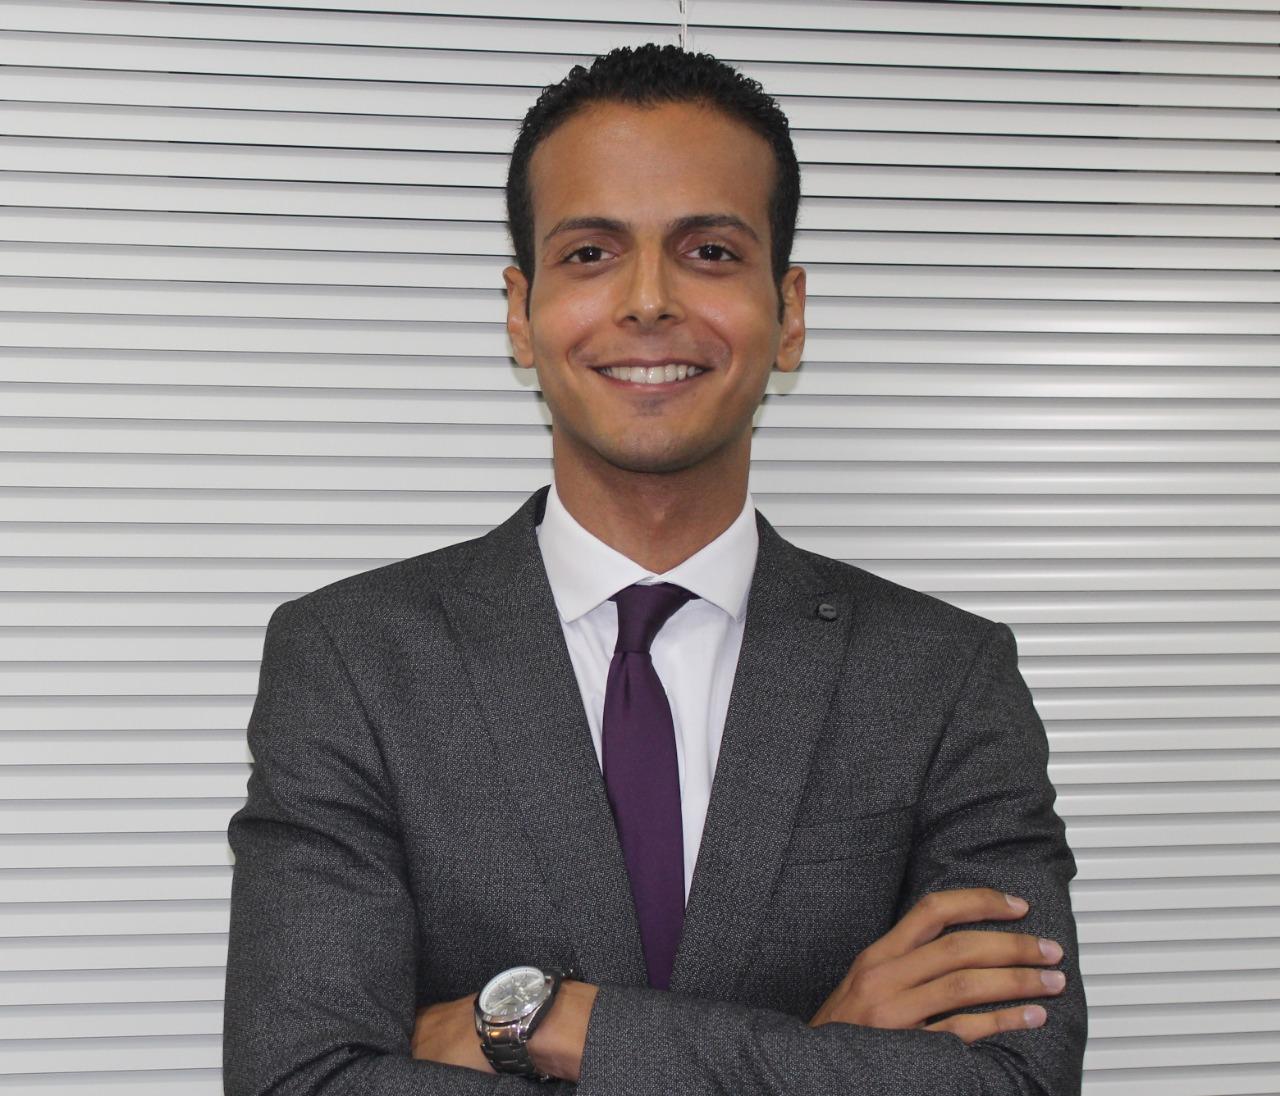 Amr El-Hussein